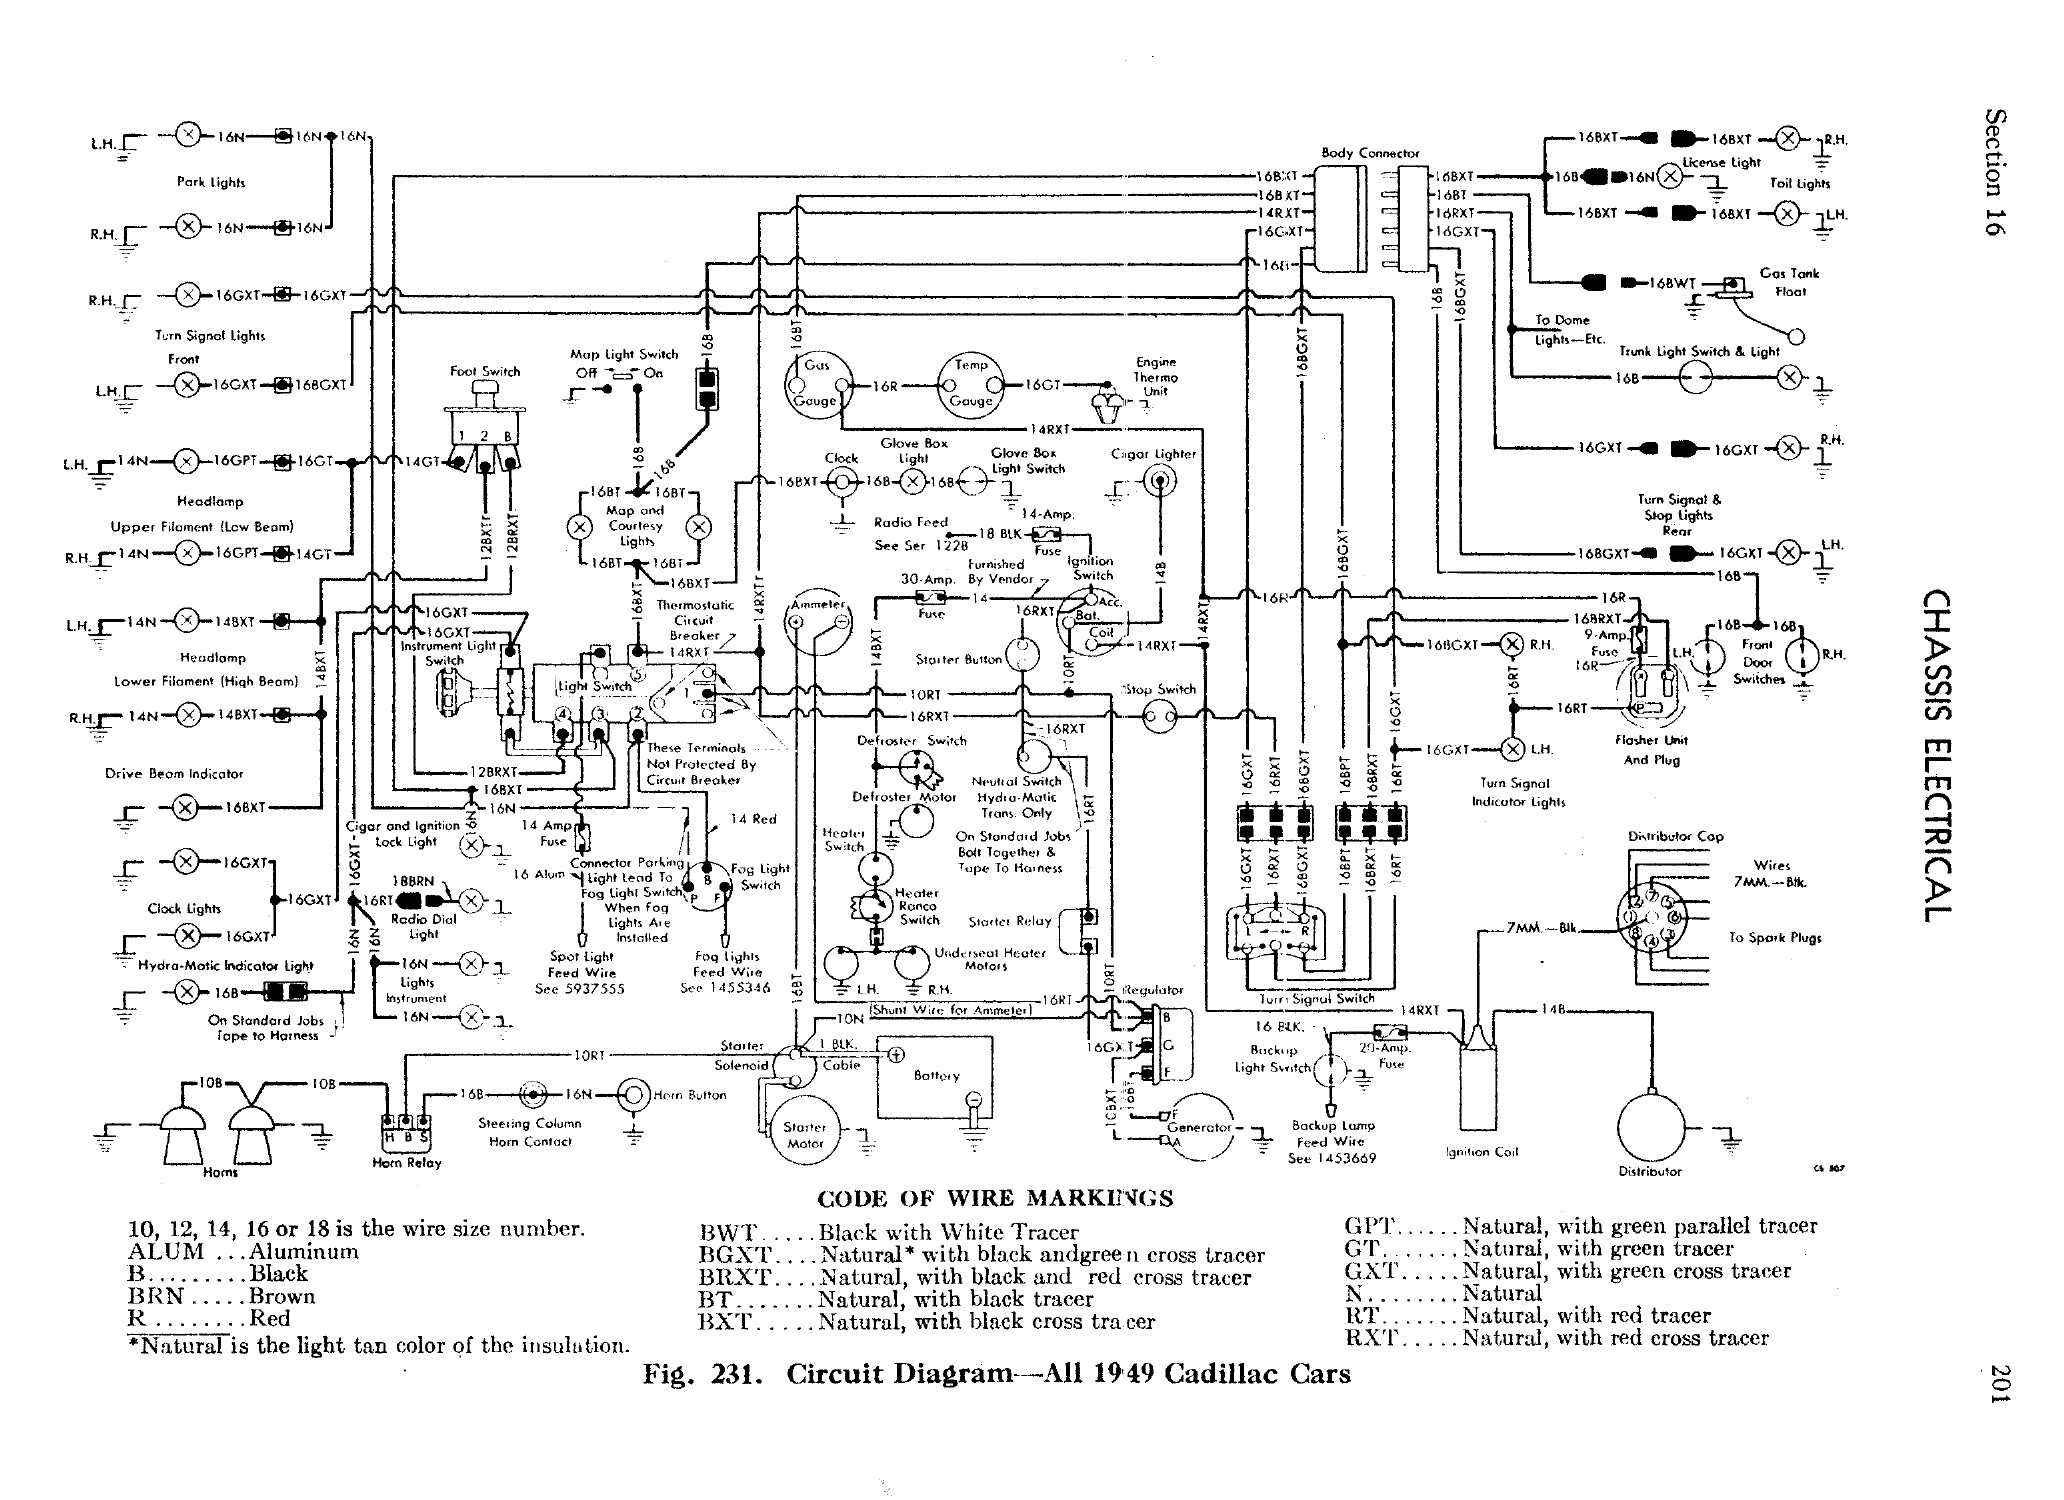 1949 cadillac wiring diagram - honda gx620 wiring motor -  subaruoutback.ati-loro.jeanjaures37.fr  wiring diagram resource